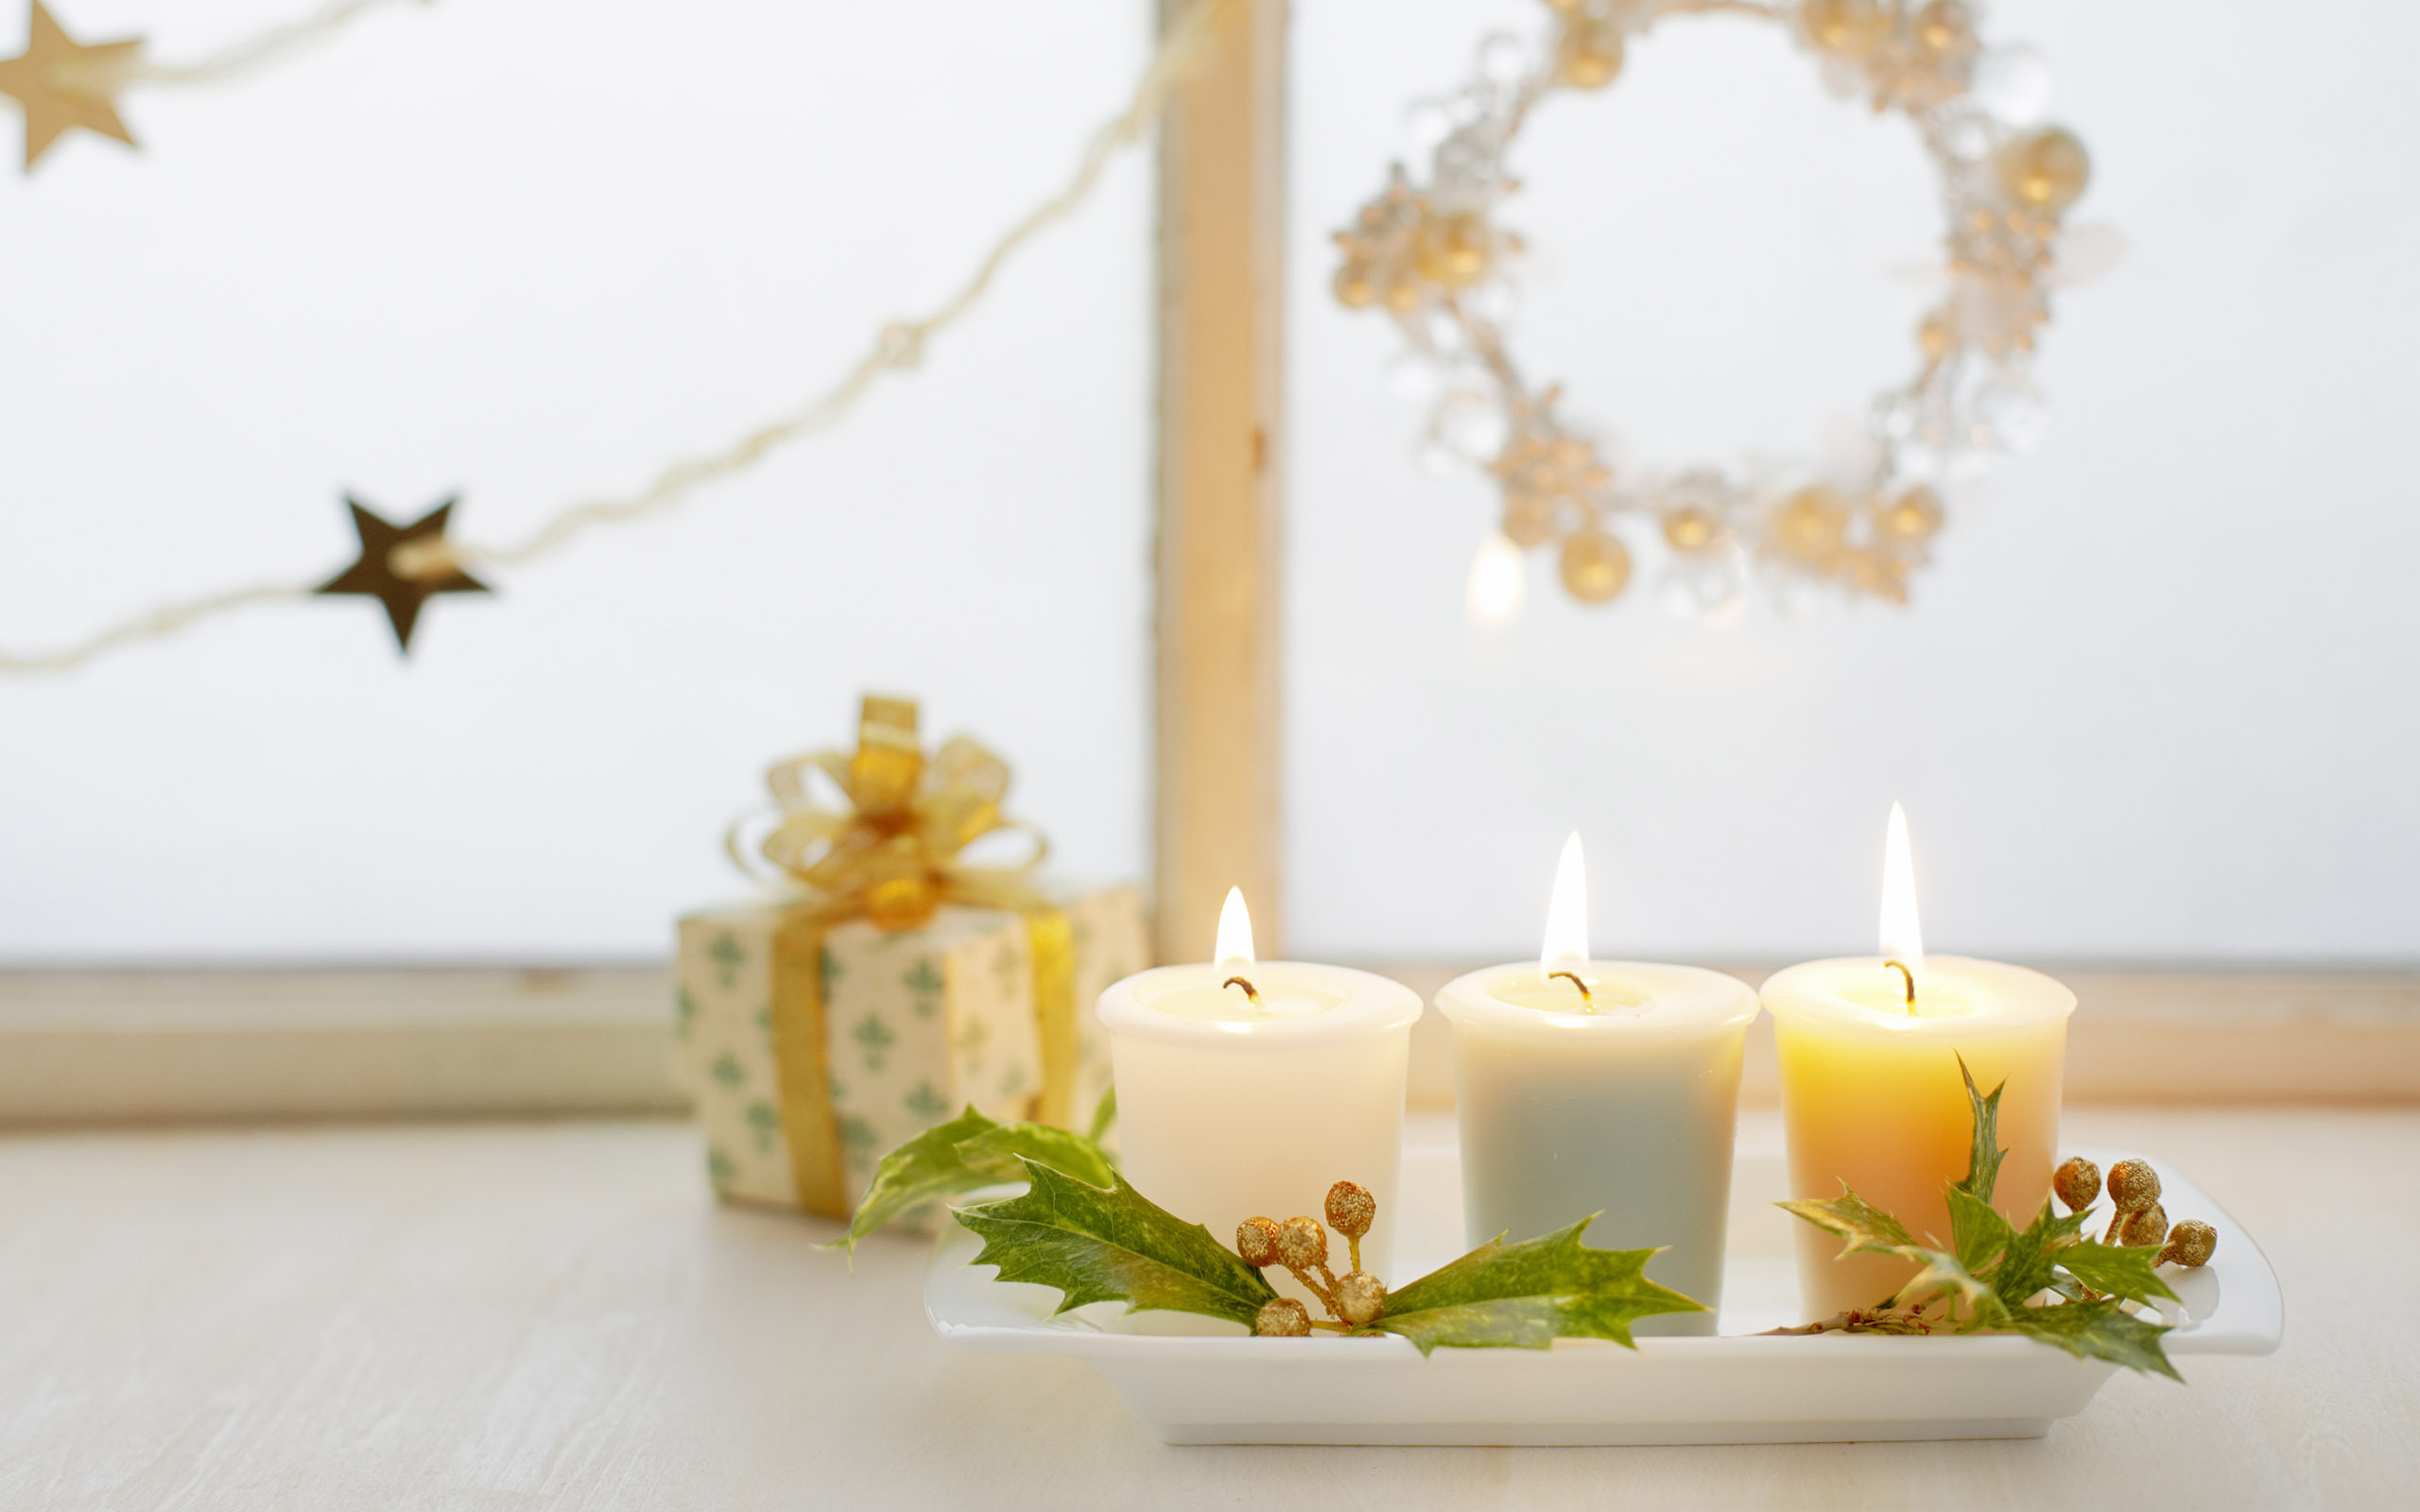 подарки новый год свечи корзинка gifts new year candles basket без смс